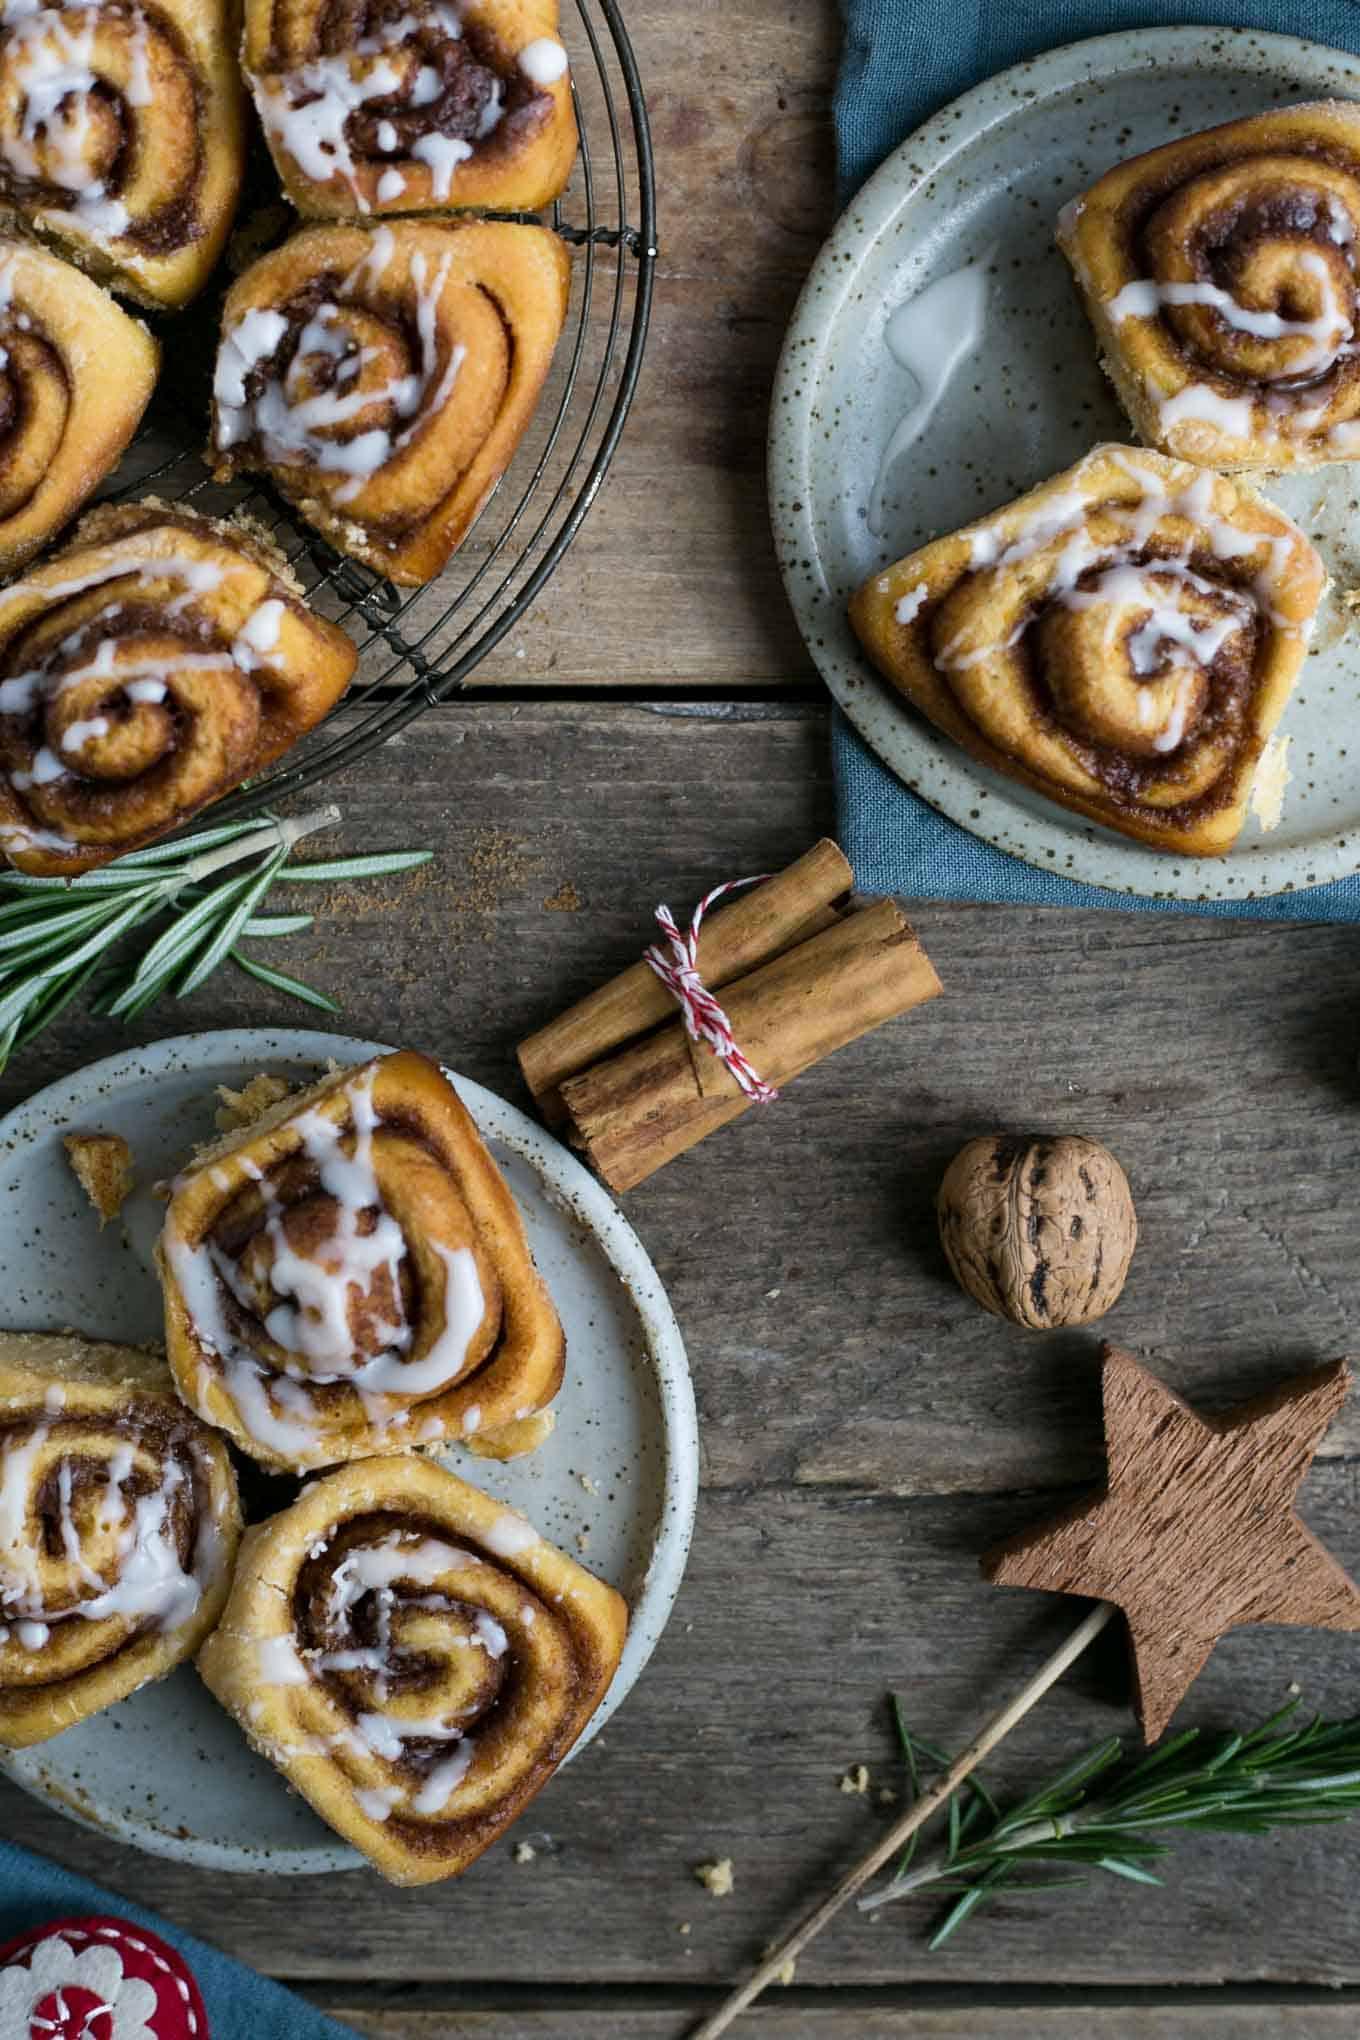 Soft and super fluffy sweet potato cinnamon rolls #vegan #cinnamonrolls | via @annabanana.co